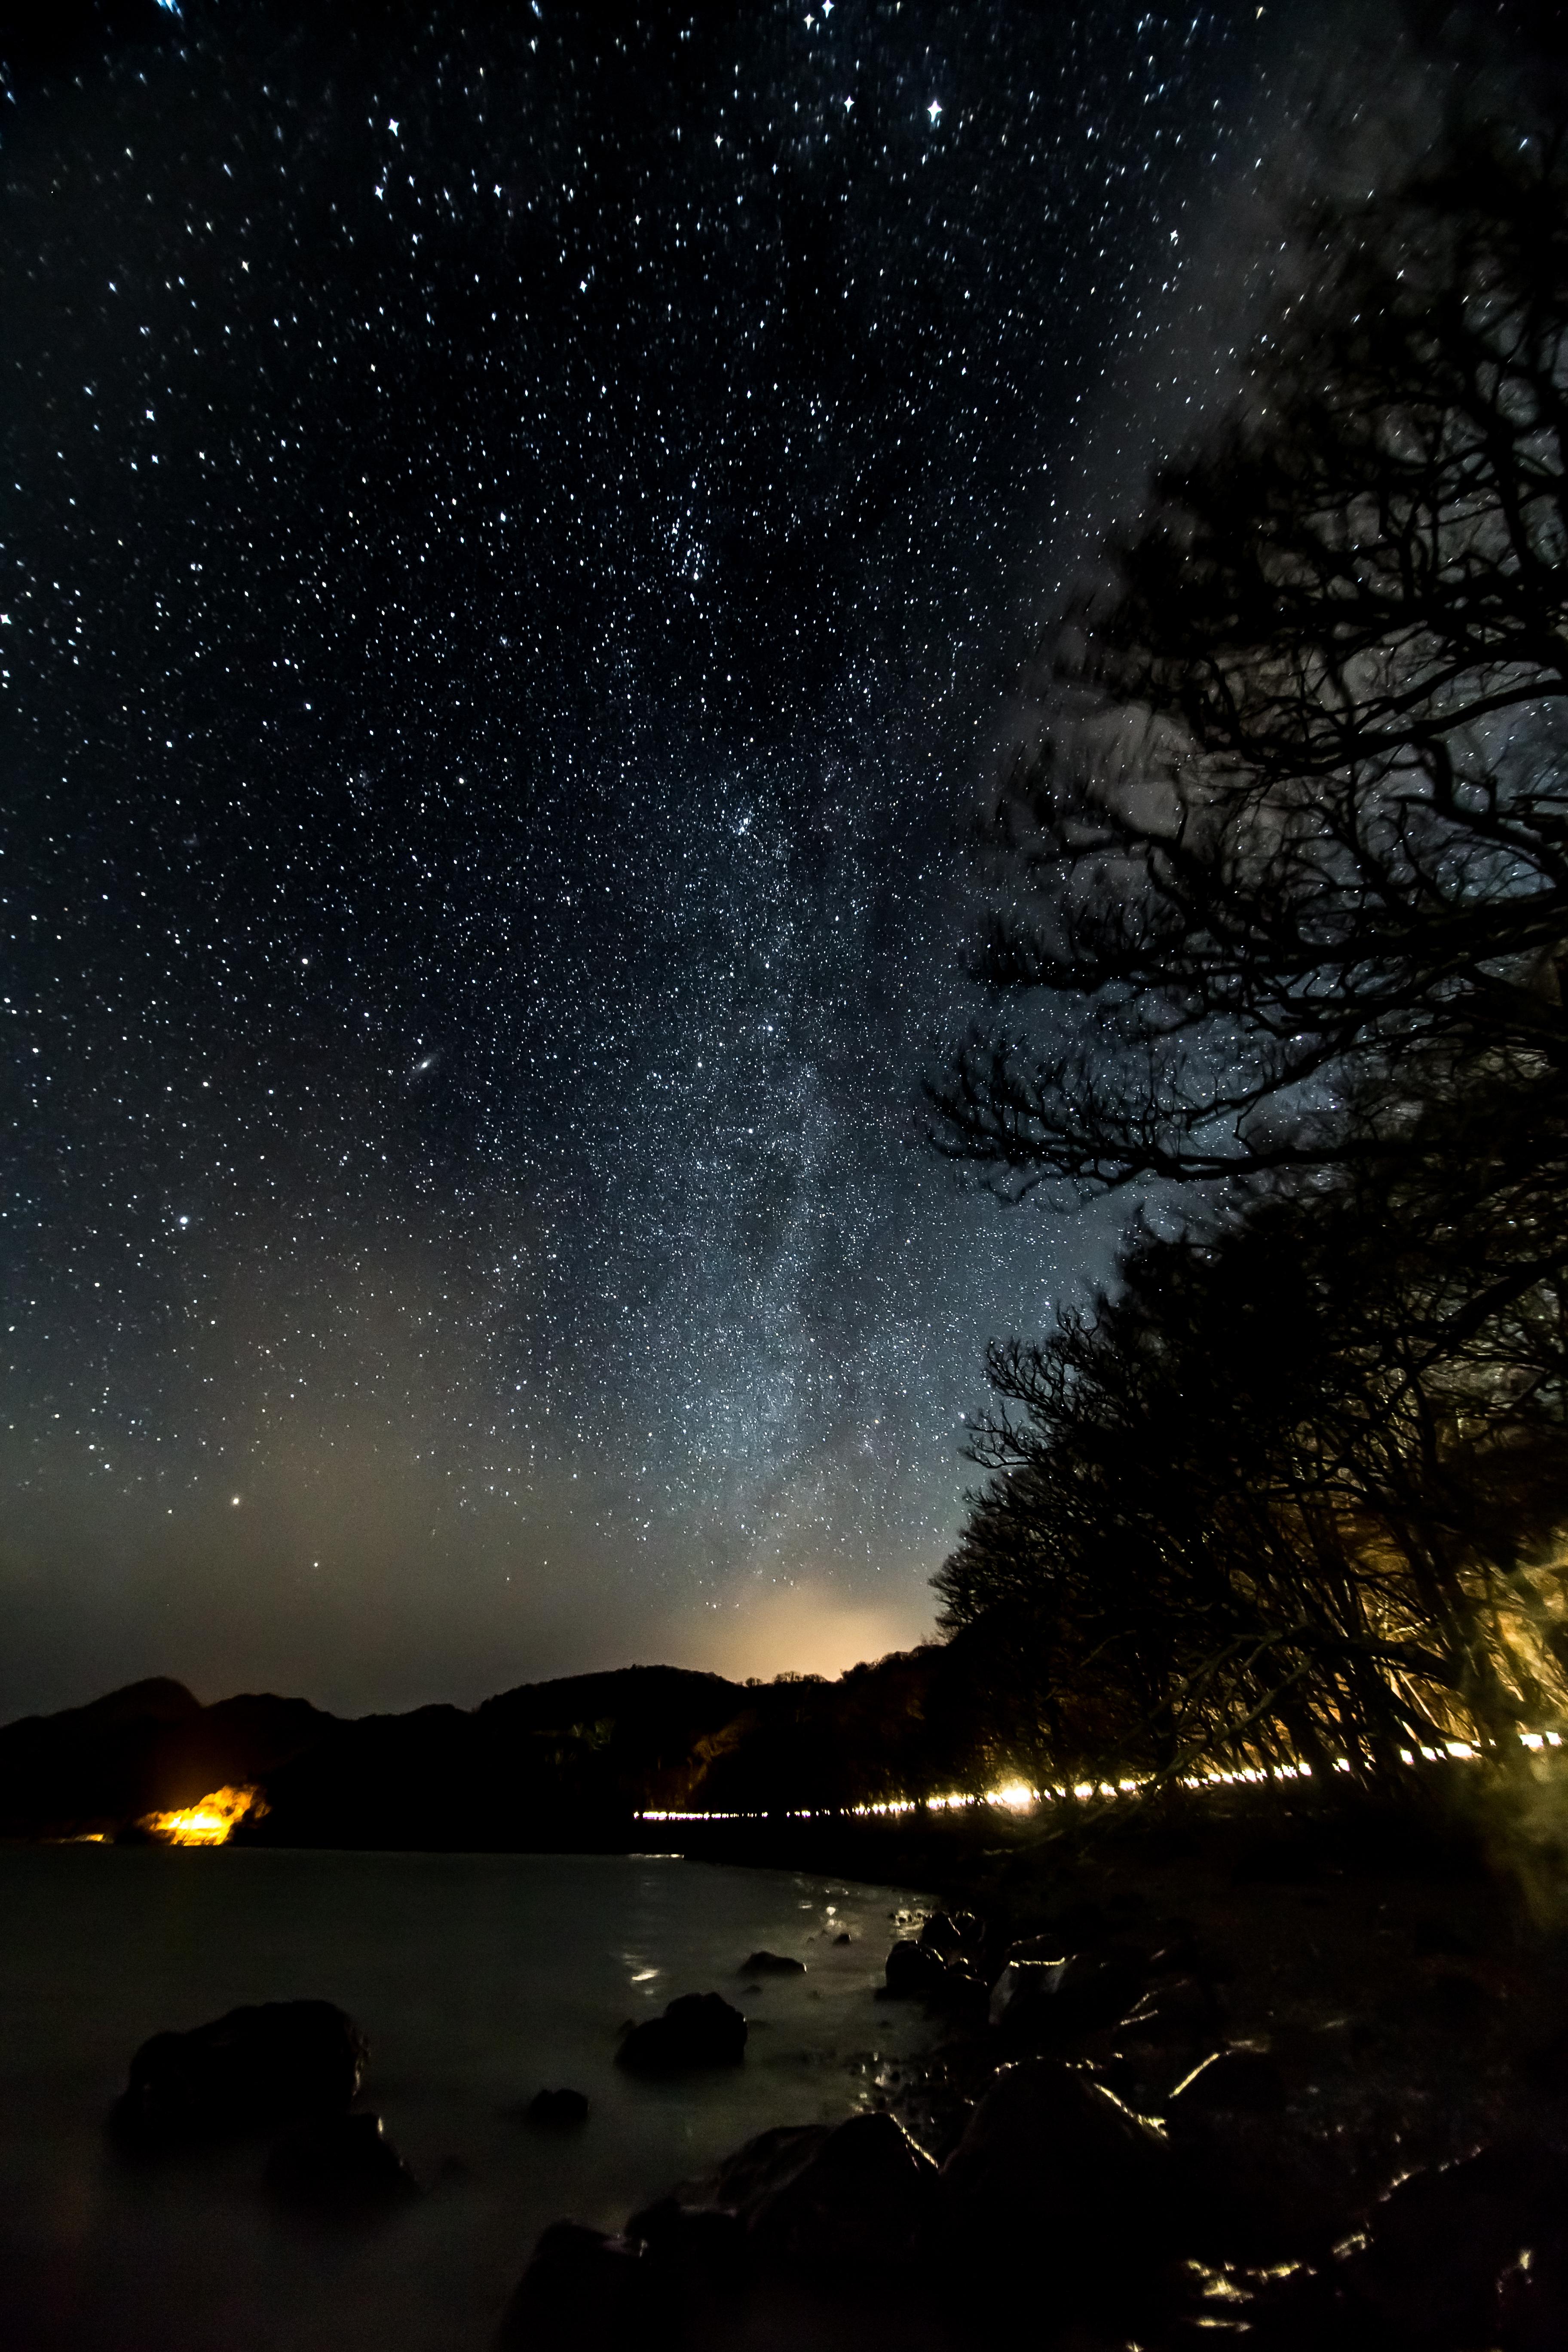 senjogahara japan mountain winter 戦場ヶ原 男体山 冬 山 日光 星空 星 夜景 stars milky way 天の川 lake 中禅寺湖